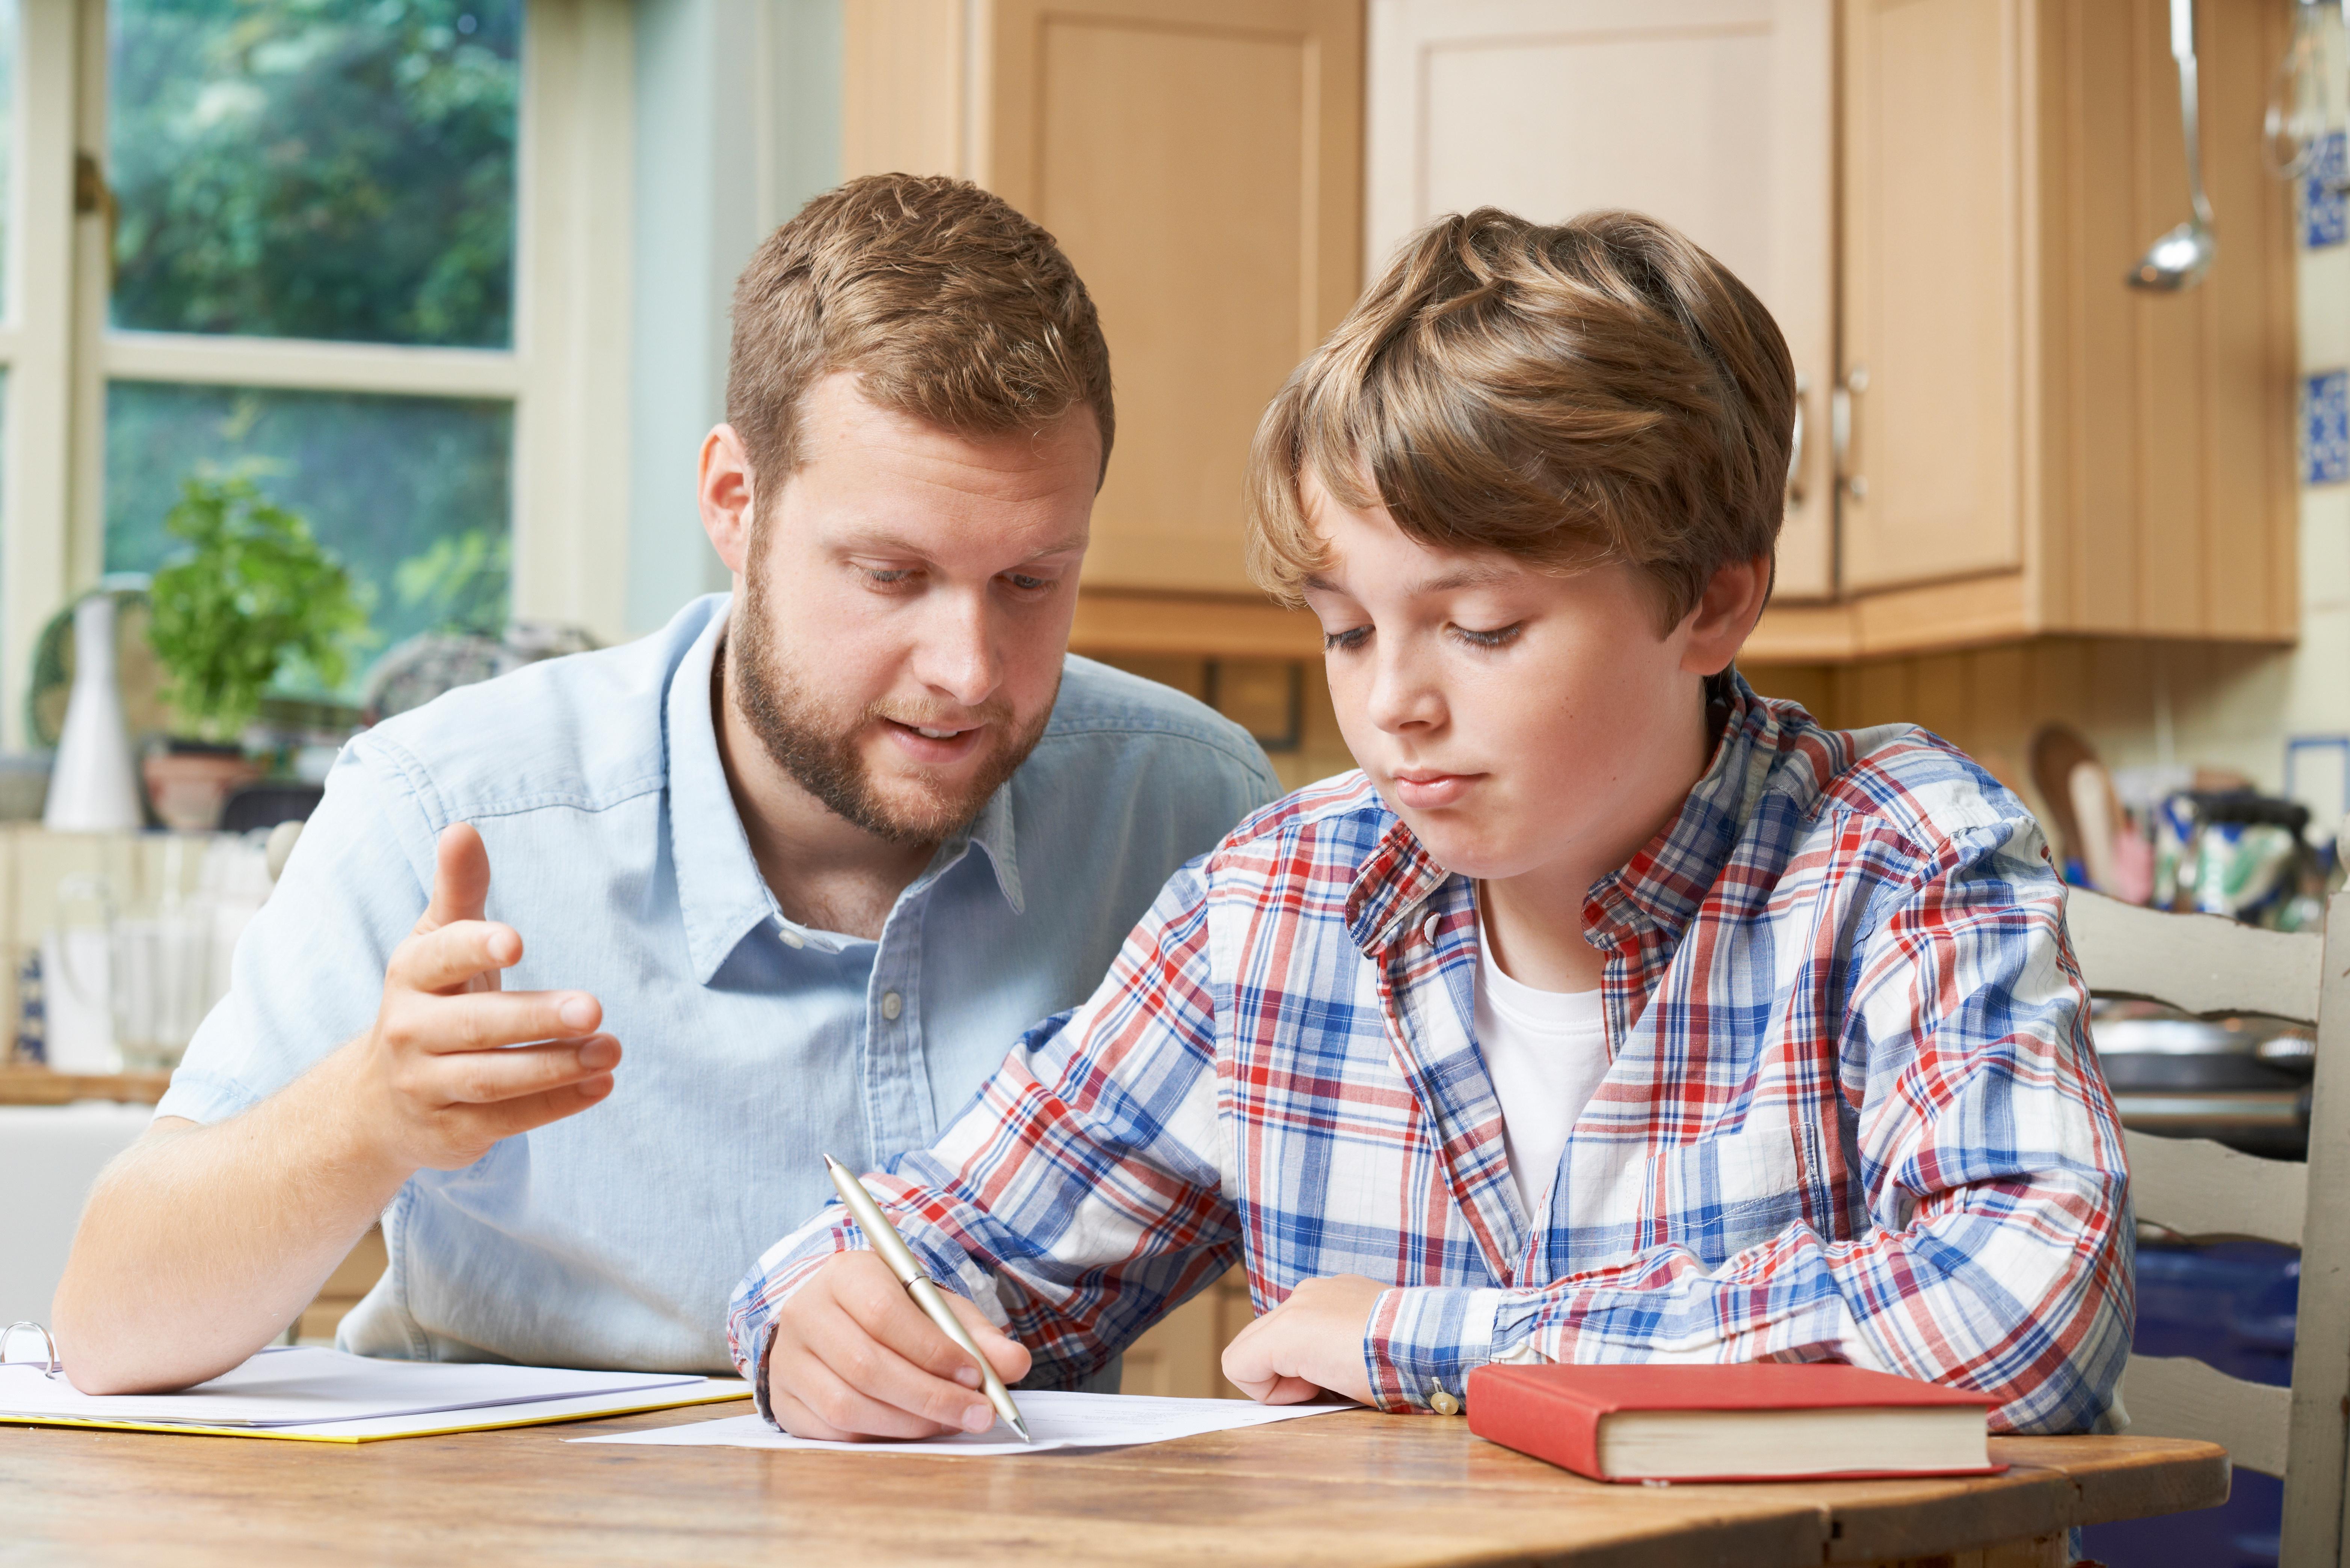 dad teaching son dad tutoring son homeschooling